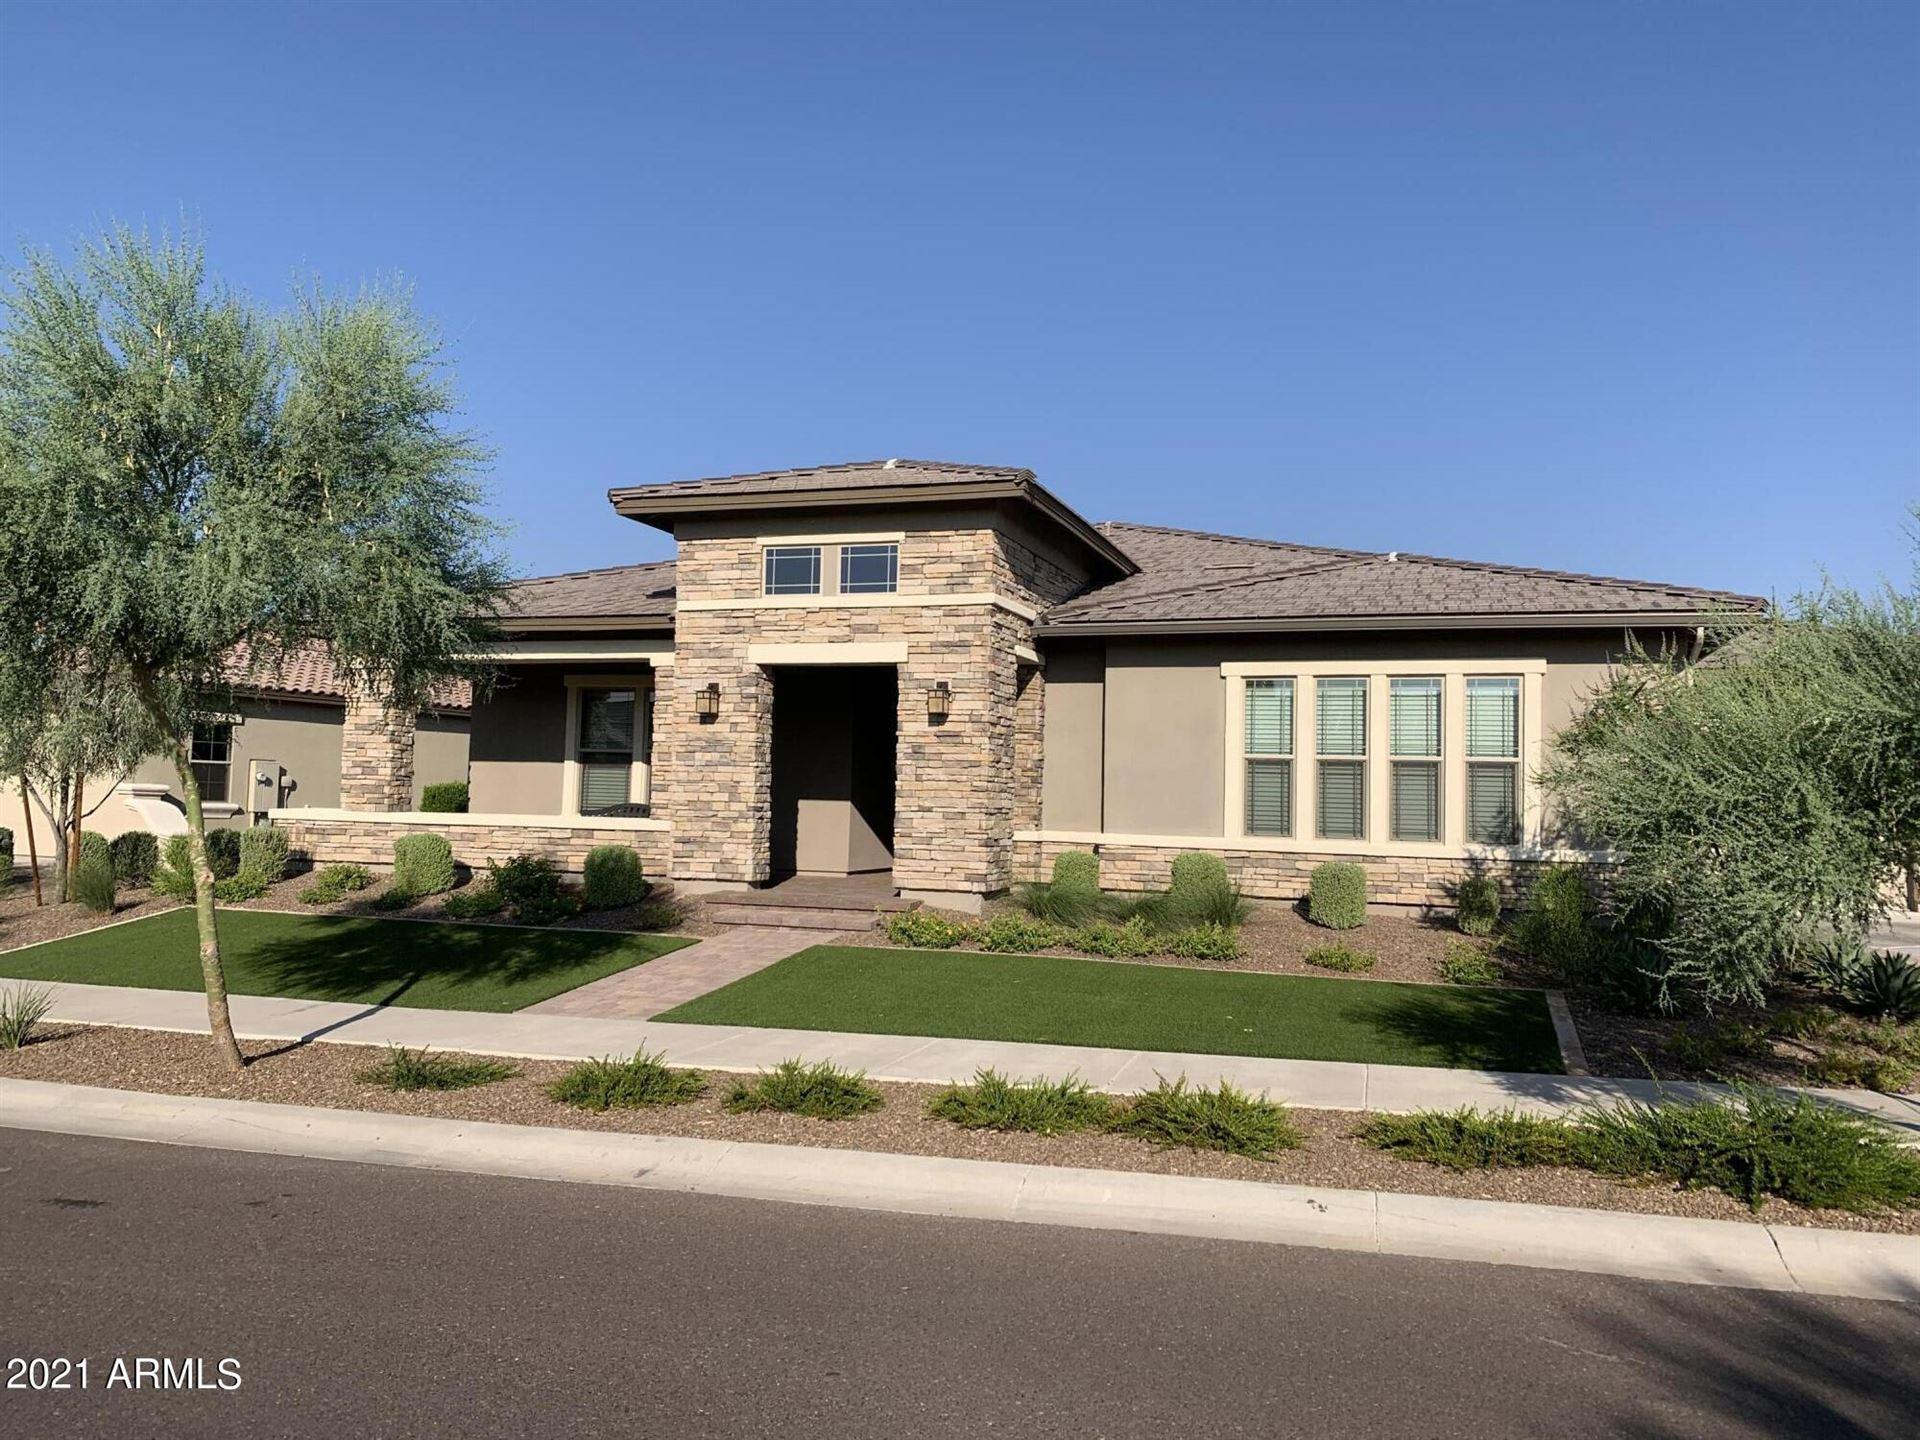 Photo of 5070 N 205TH Glen, Buckeye, AZ 85396 (MLS # 6295198)